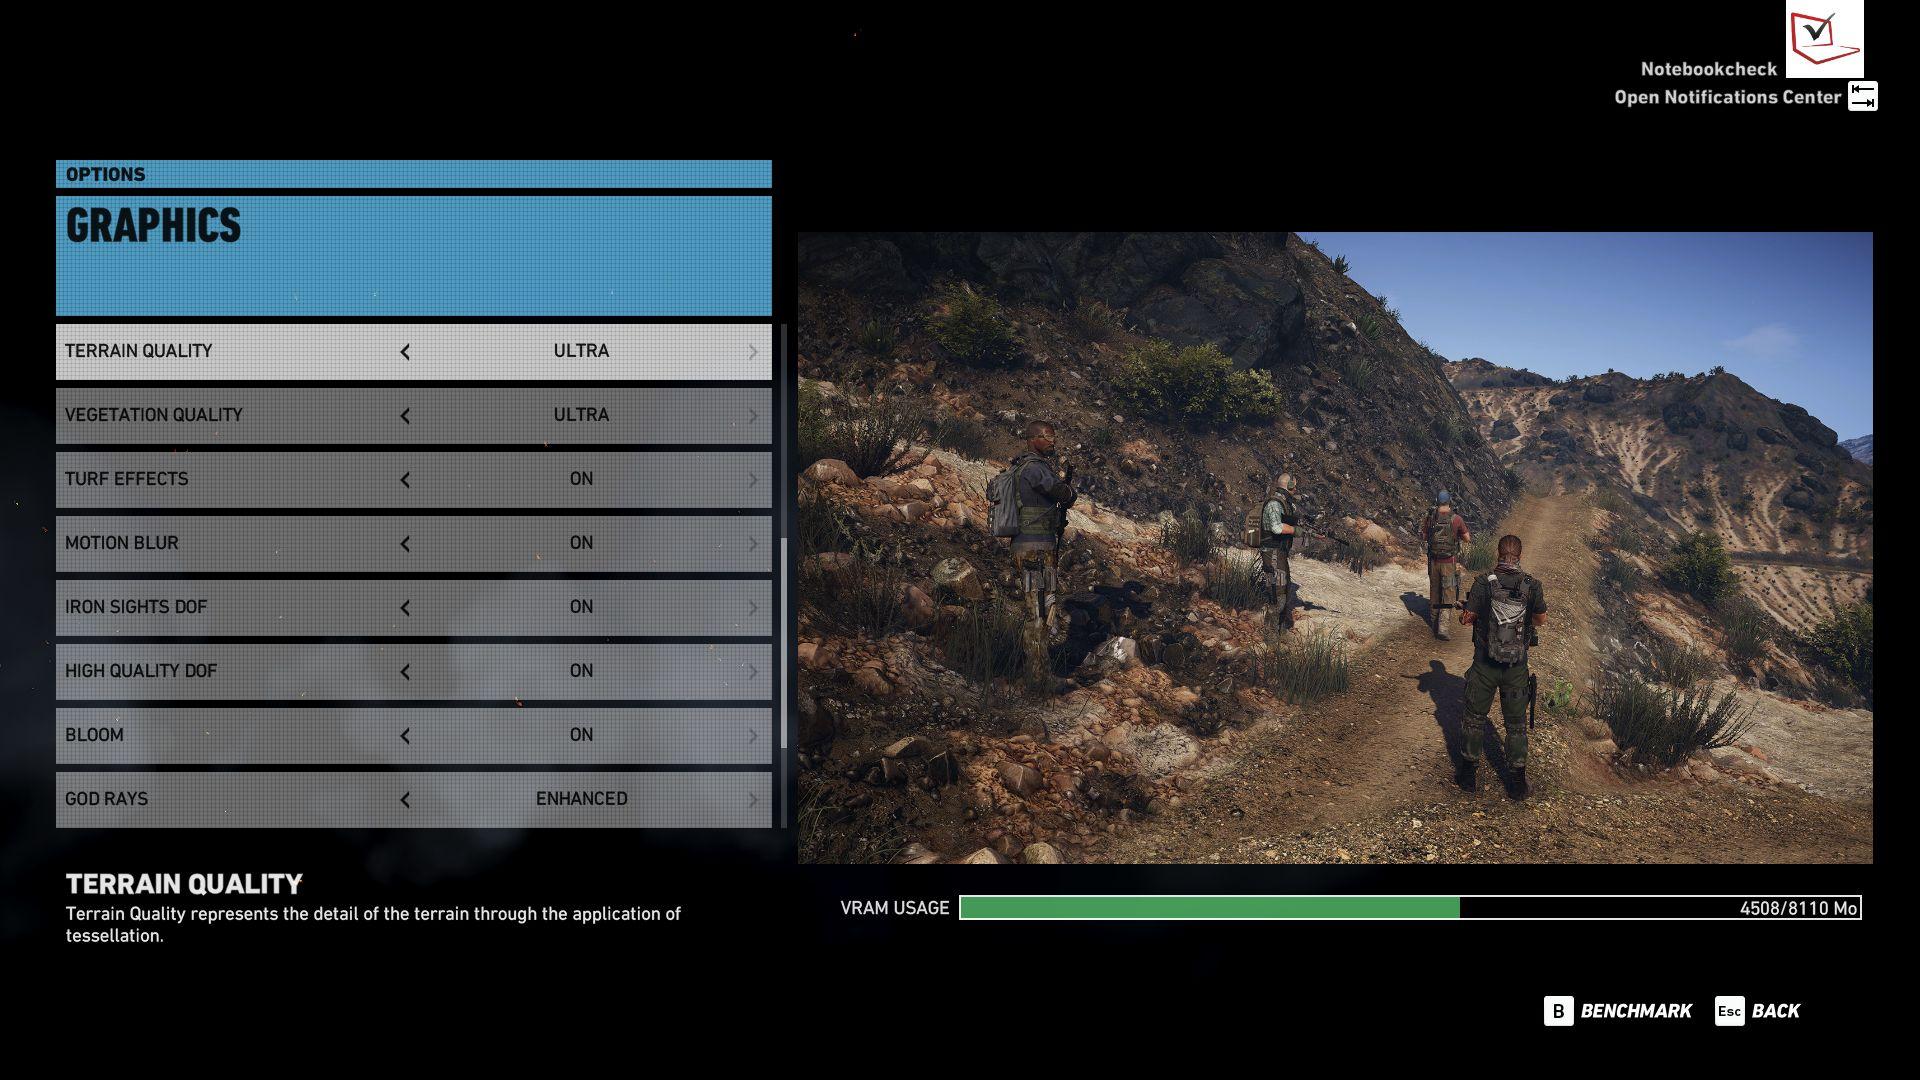 Ghost Recon Wildlands Notebook and Desktop Benchmarks